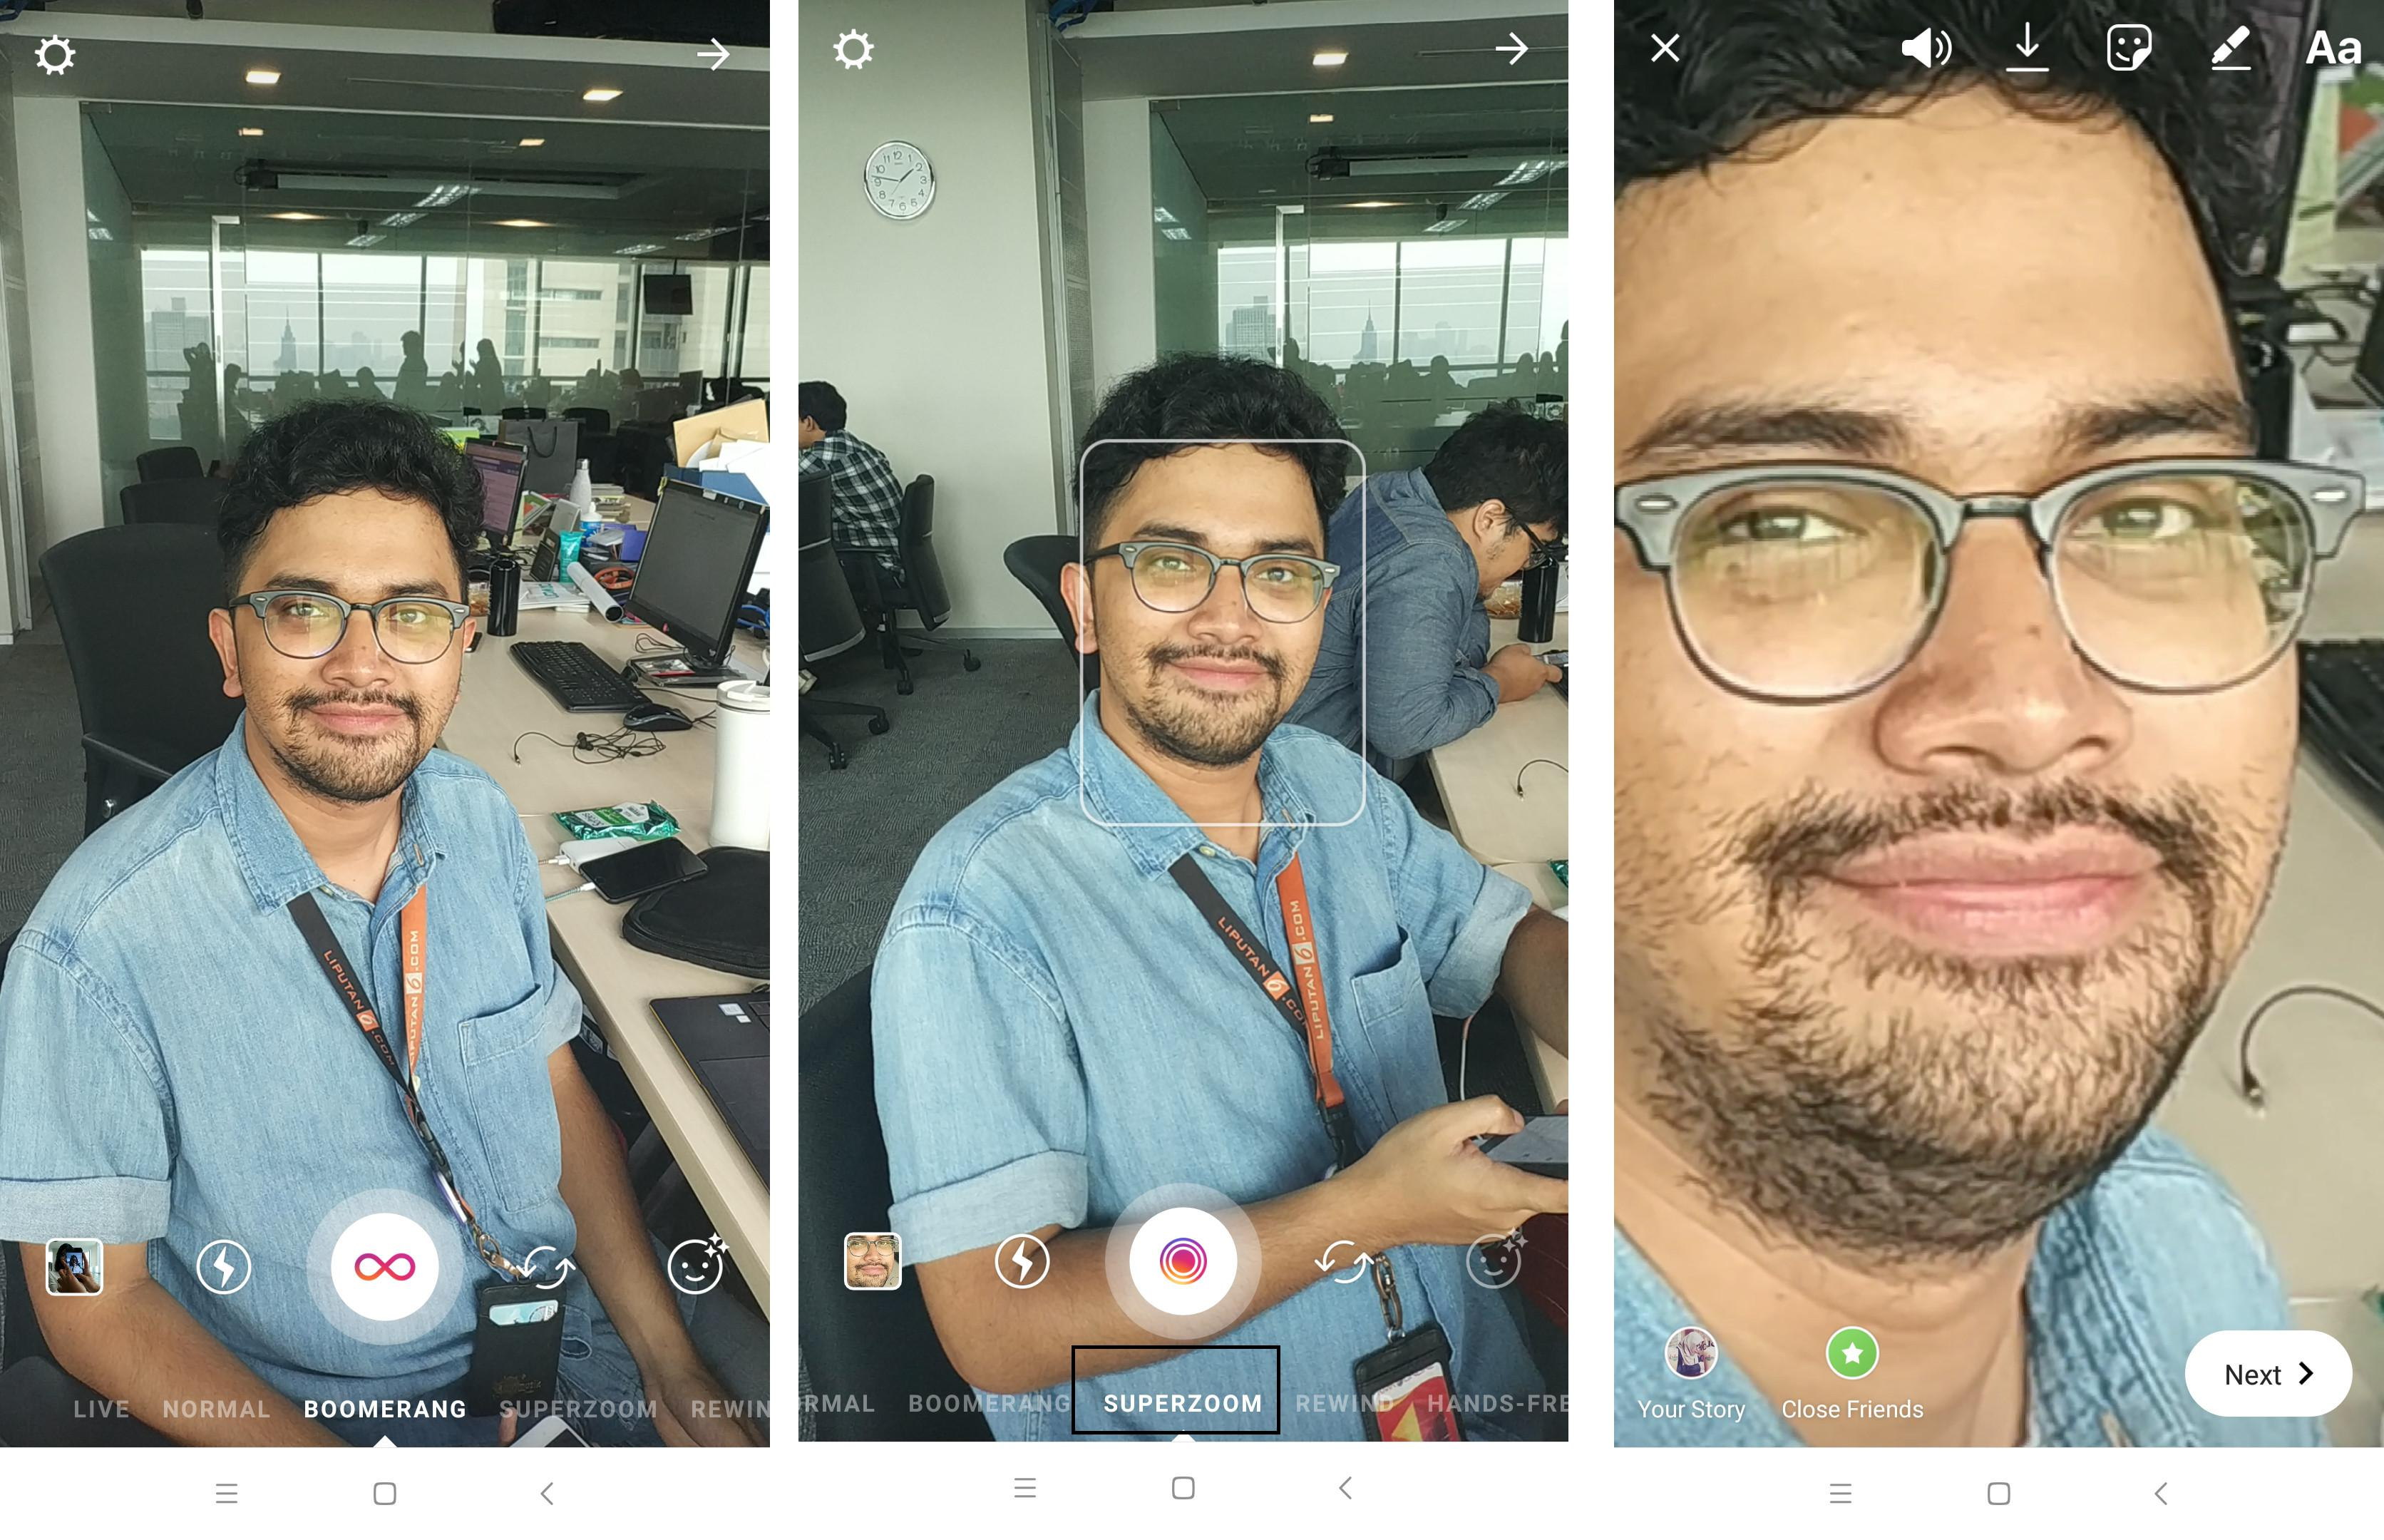 Instagram menghadirkan fitur Superzoom di Instagram Stories (Liputan6.com/ Agustin Setyo W)